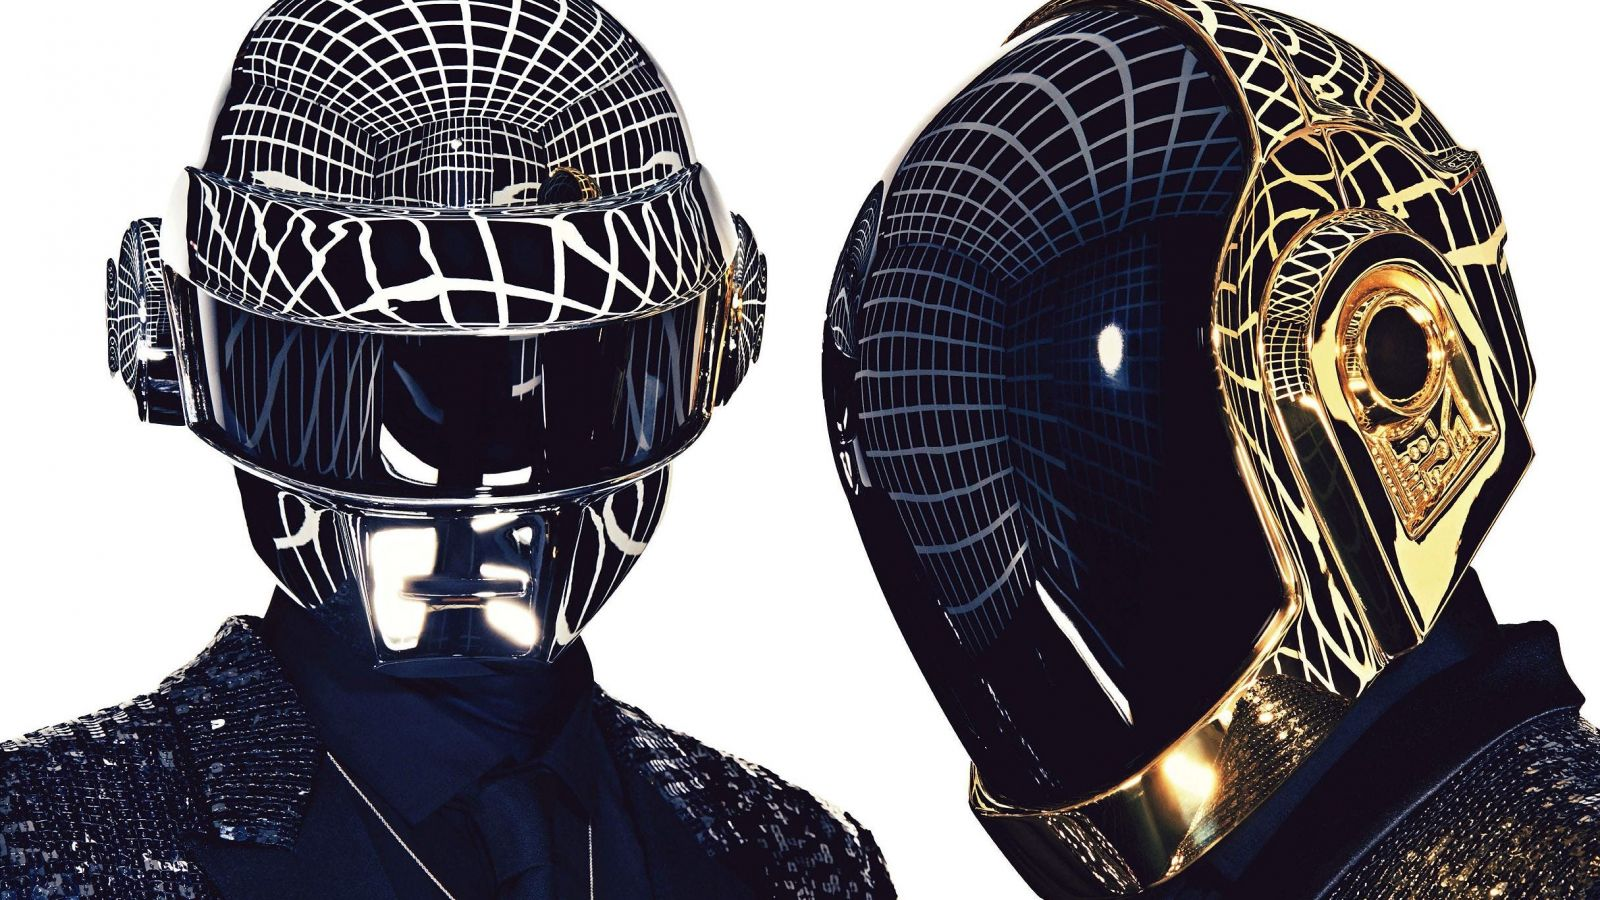 Daft Punk: Ο επίλογος για το διάσημο δίδυμο της μουσικής [vid]